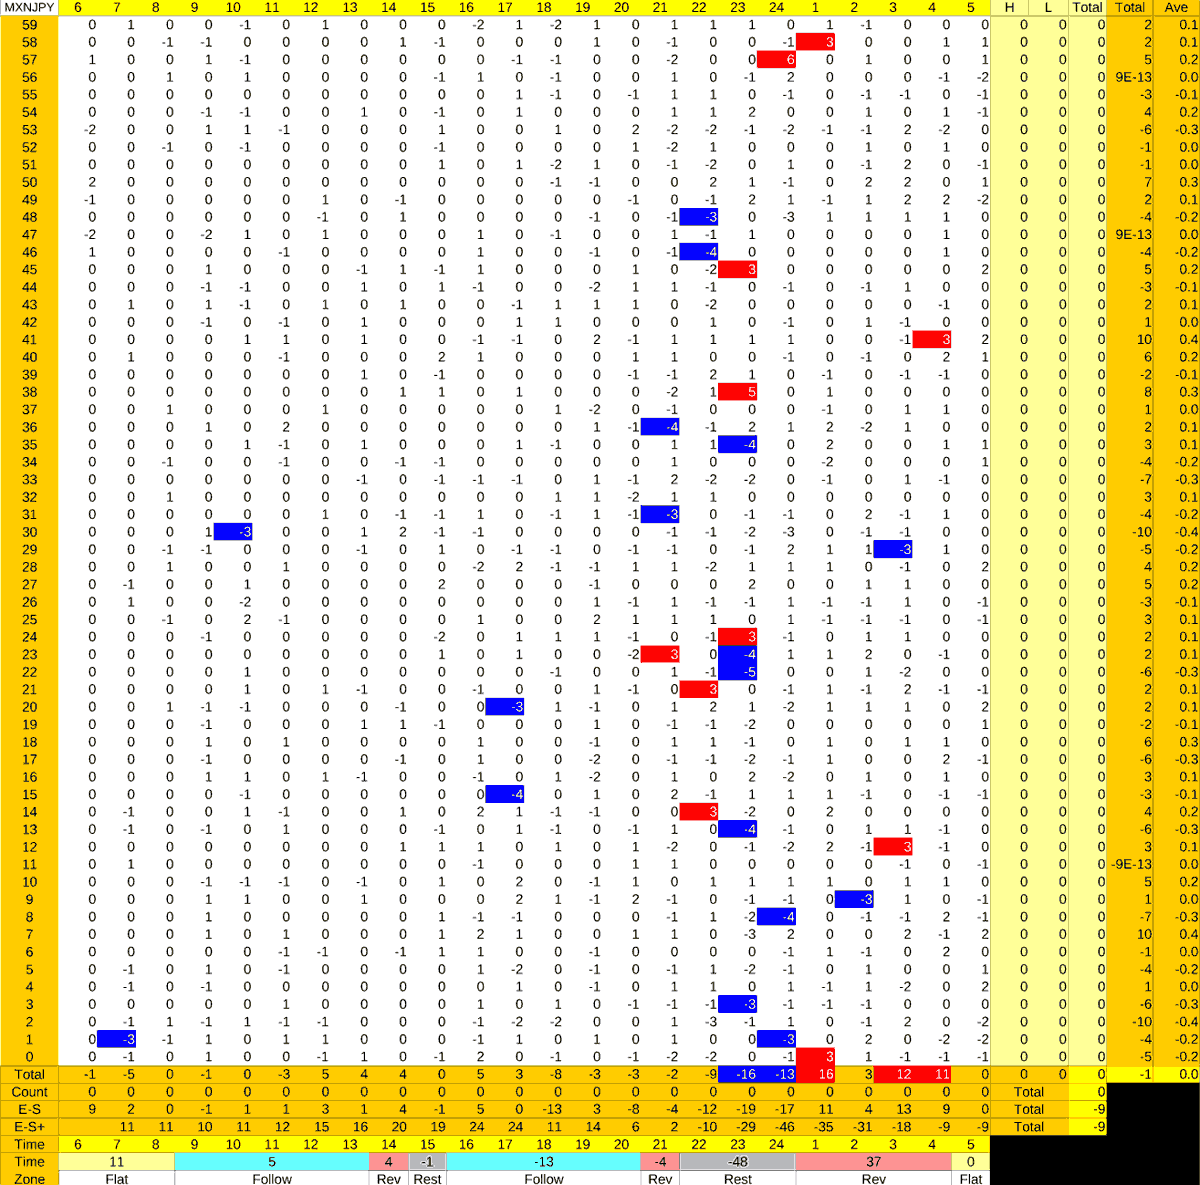 20210615_HS(3)MXNJPY-